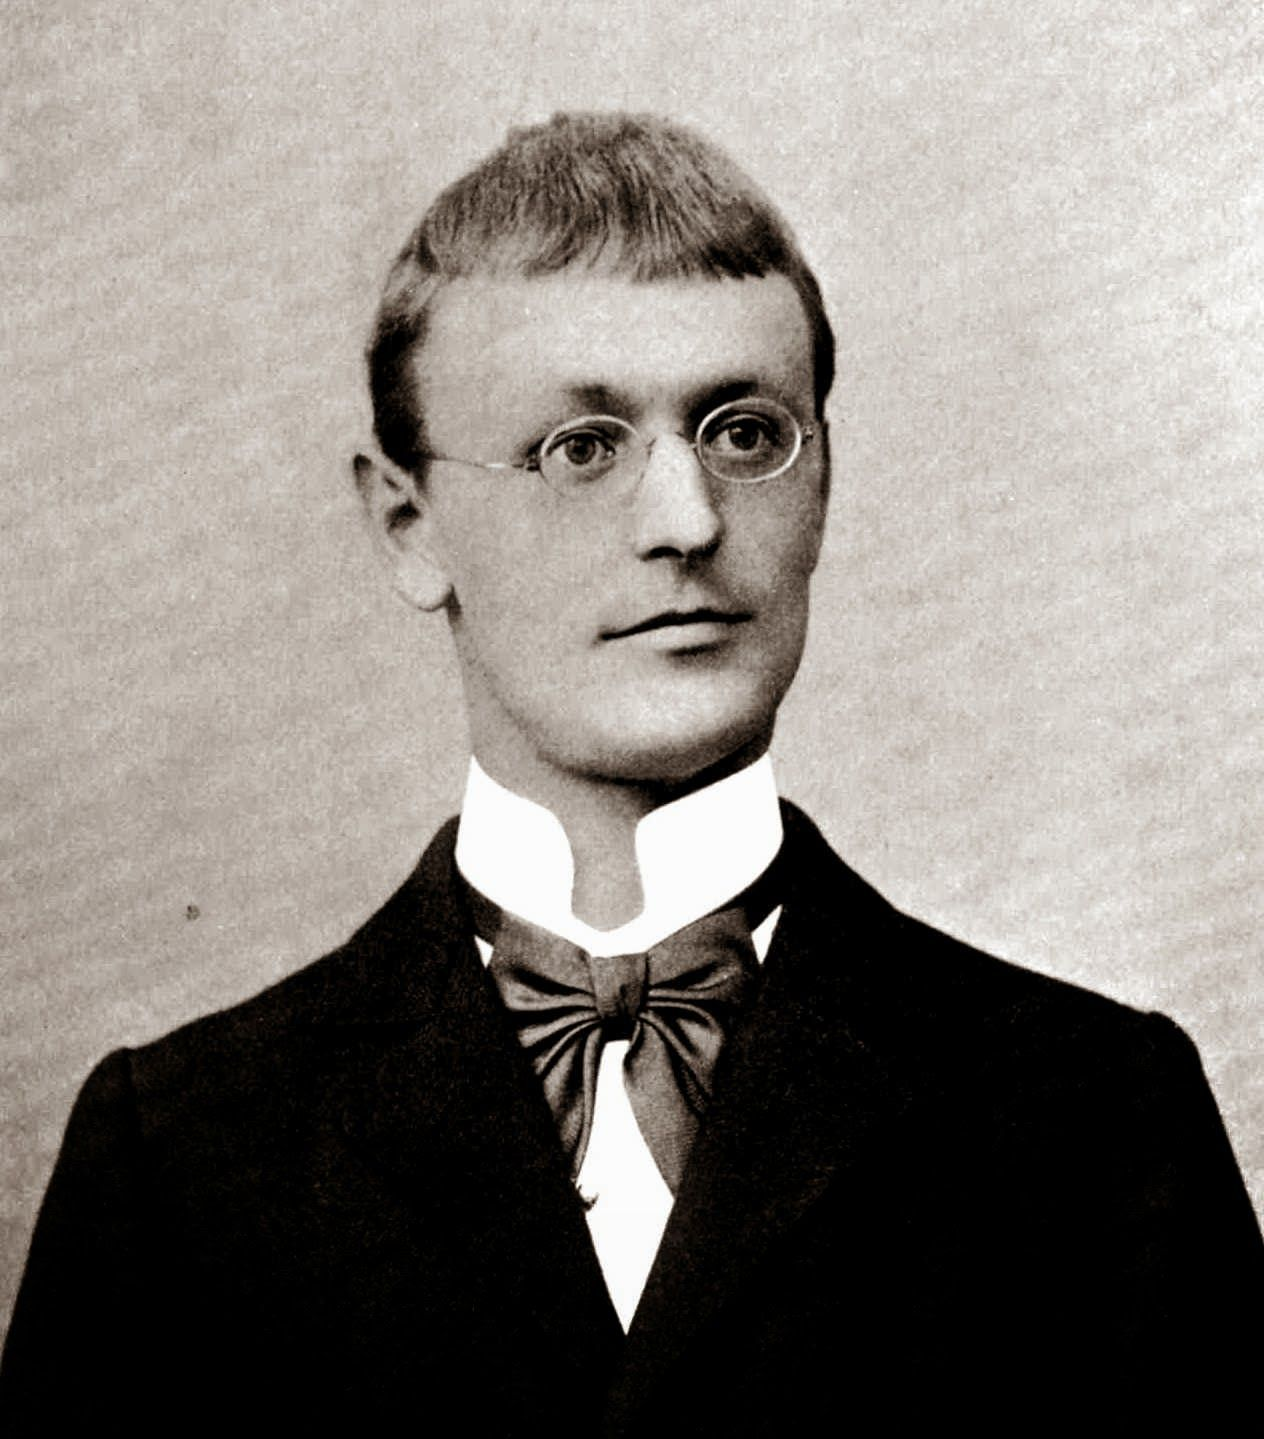 Hermann Hesse joven